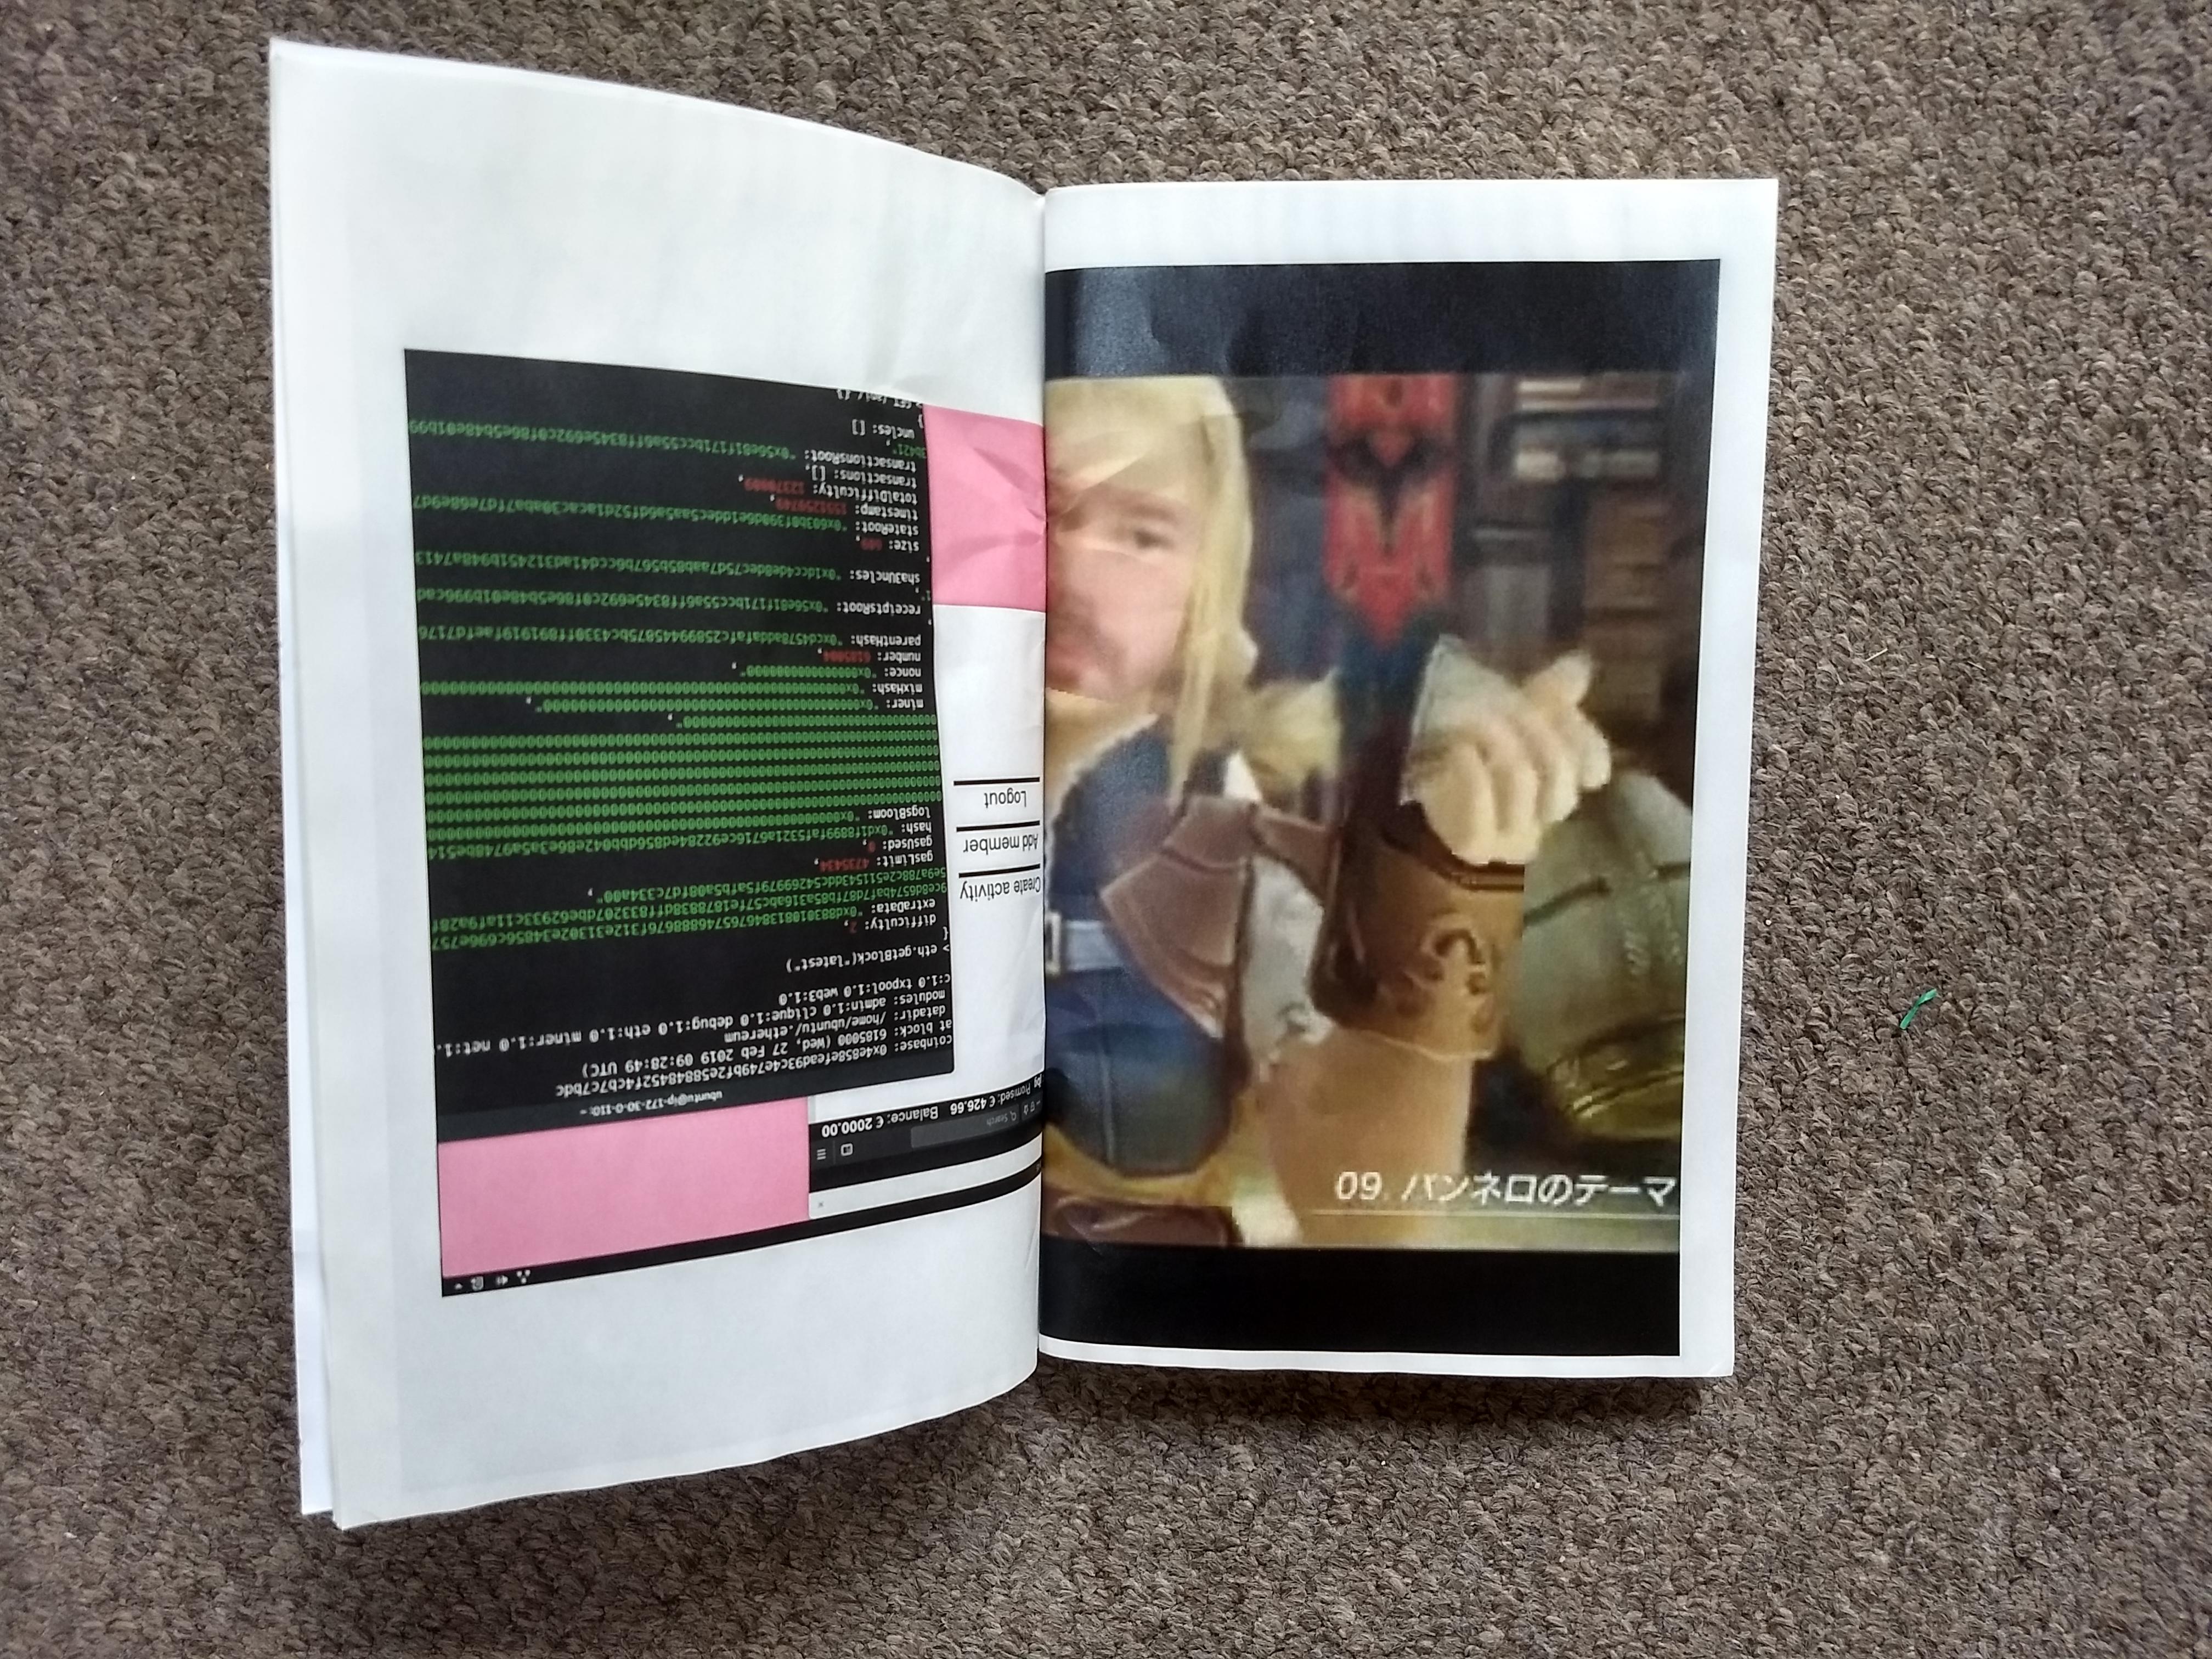 FlaskApp/static/images/samples-of-work/publications/hnd-fake-it4.jpg